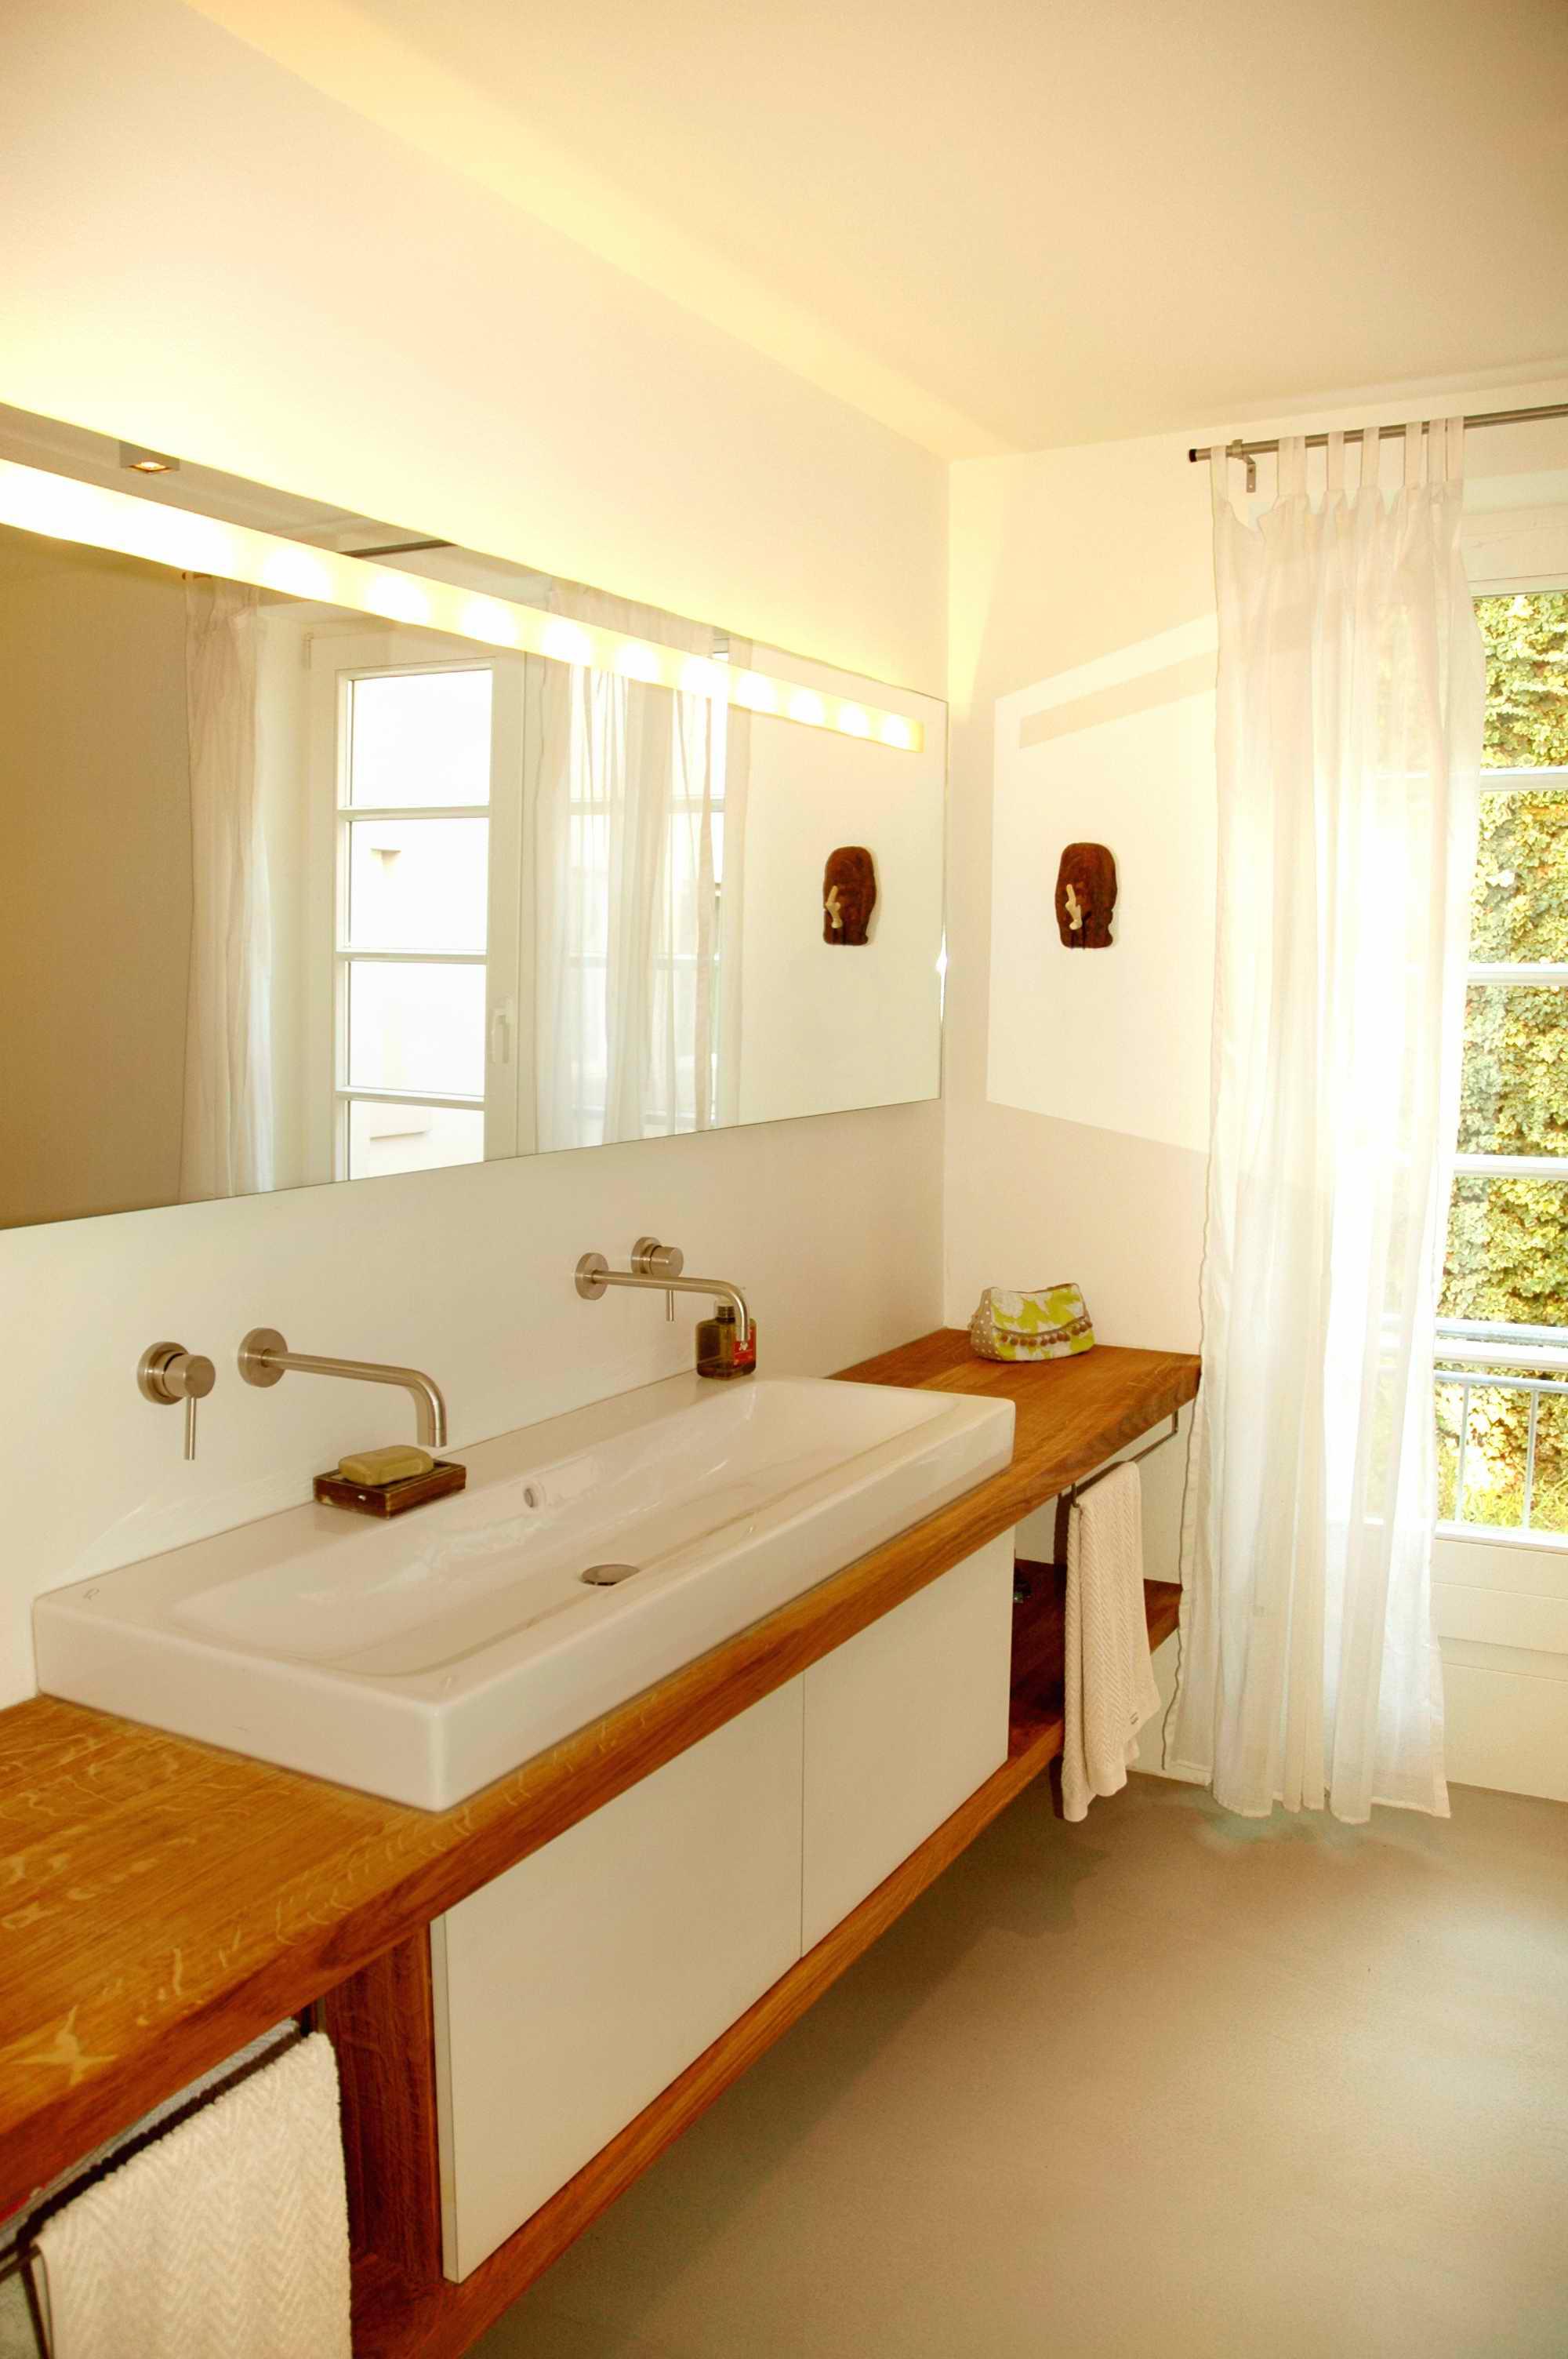 innenarchitekten wiesbaden 20 honeyandspice. Black Bedroom Furniture Sets. Home Design Ideas